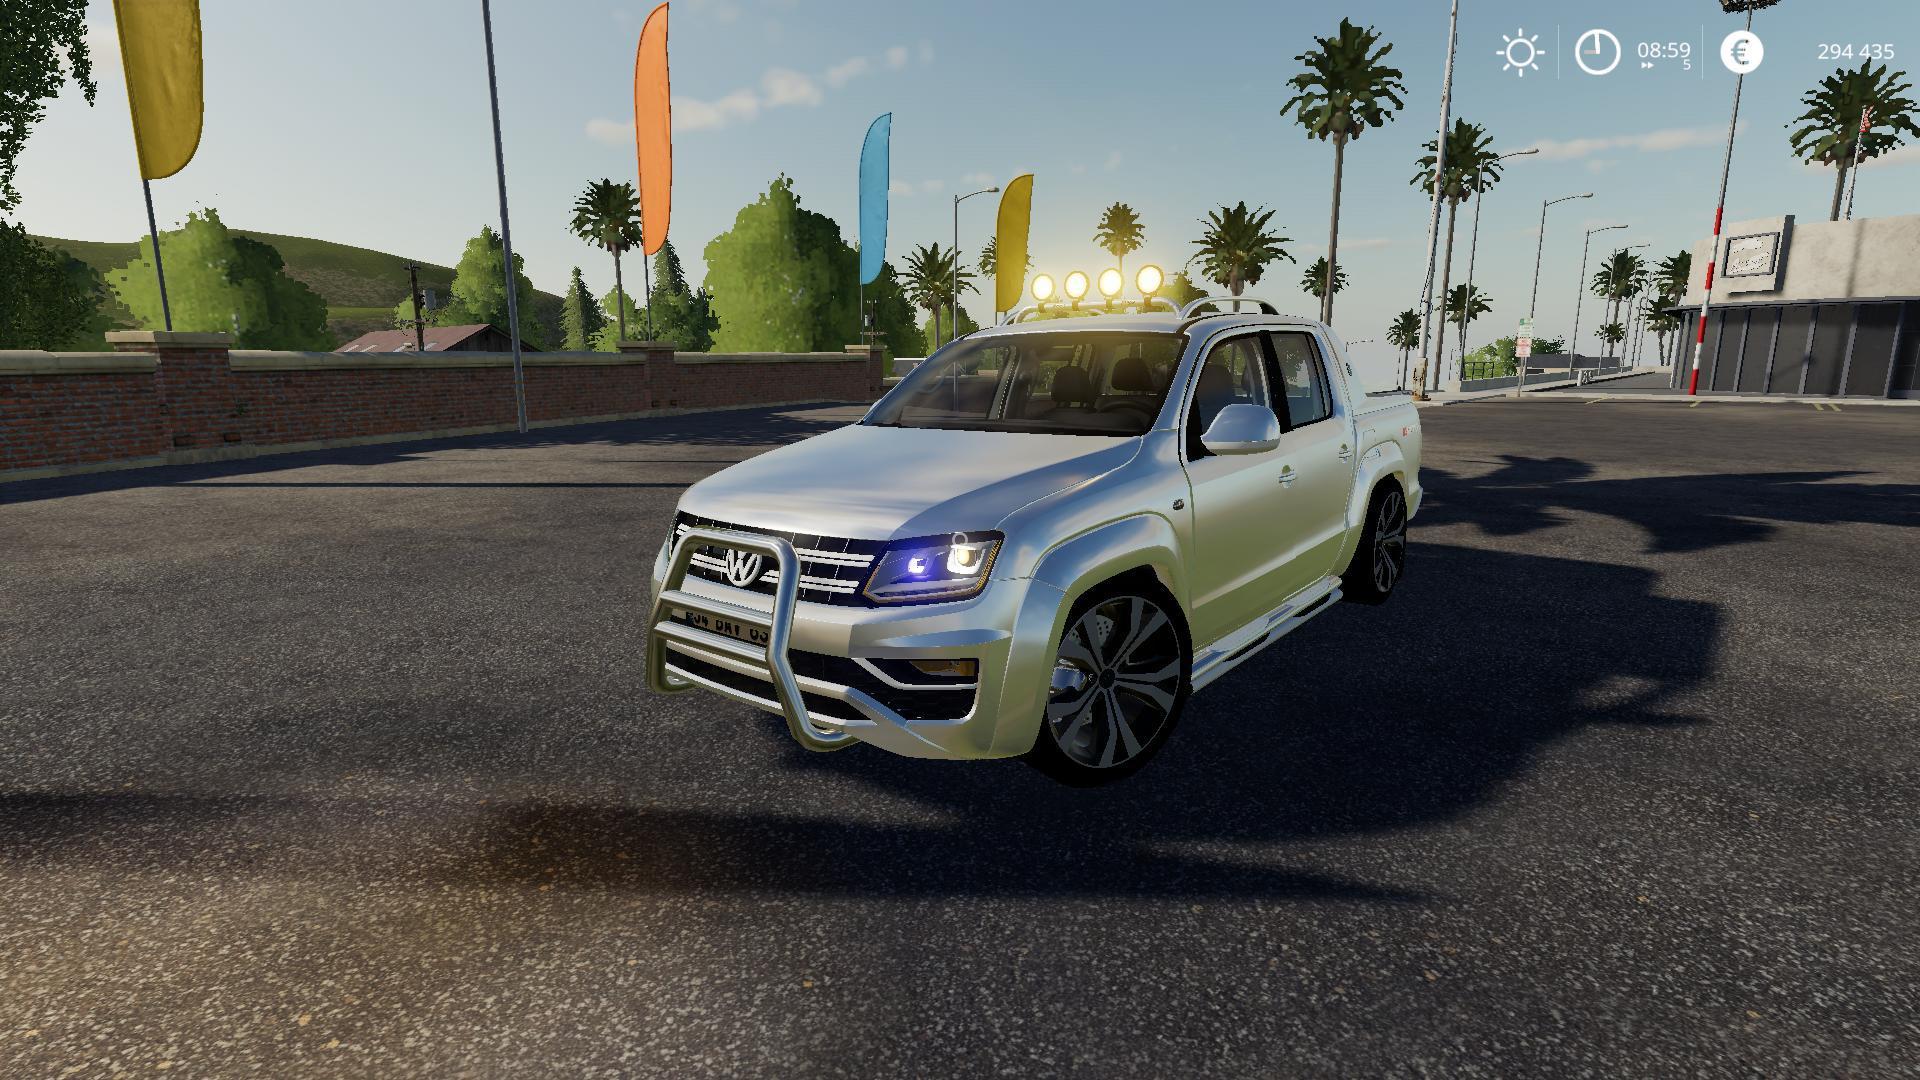 FS19 - Volkswagen Amarok V2.0